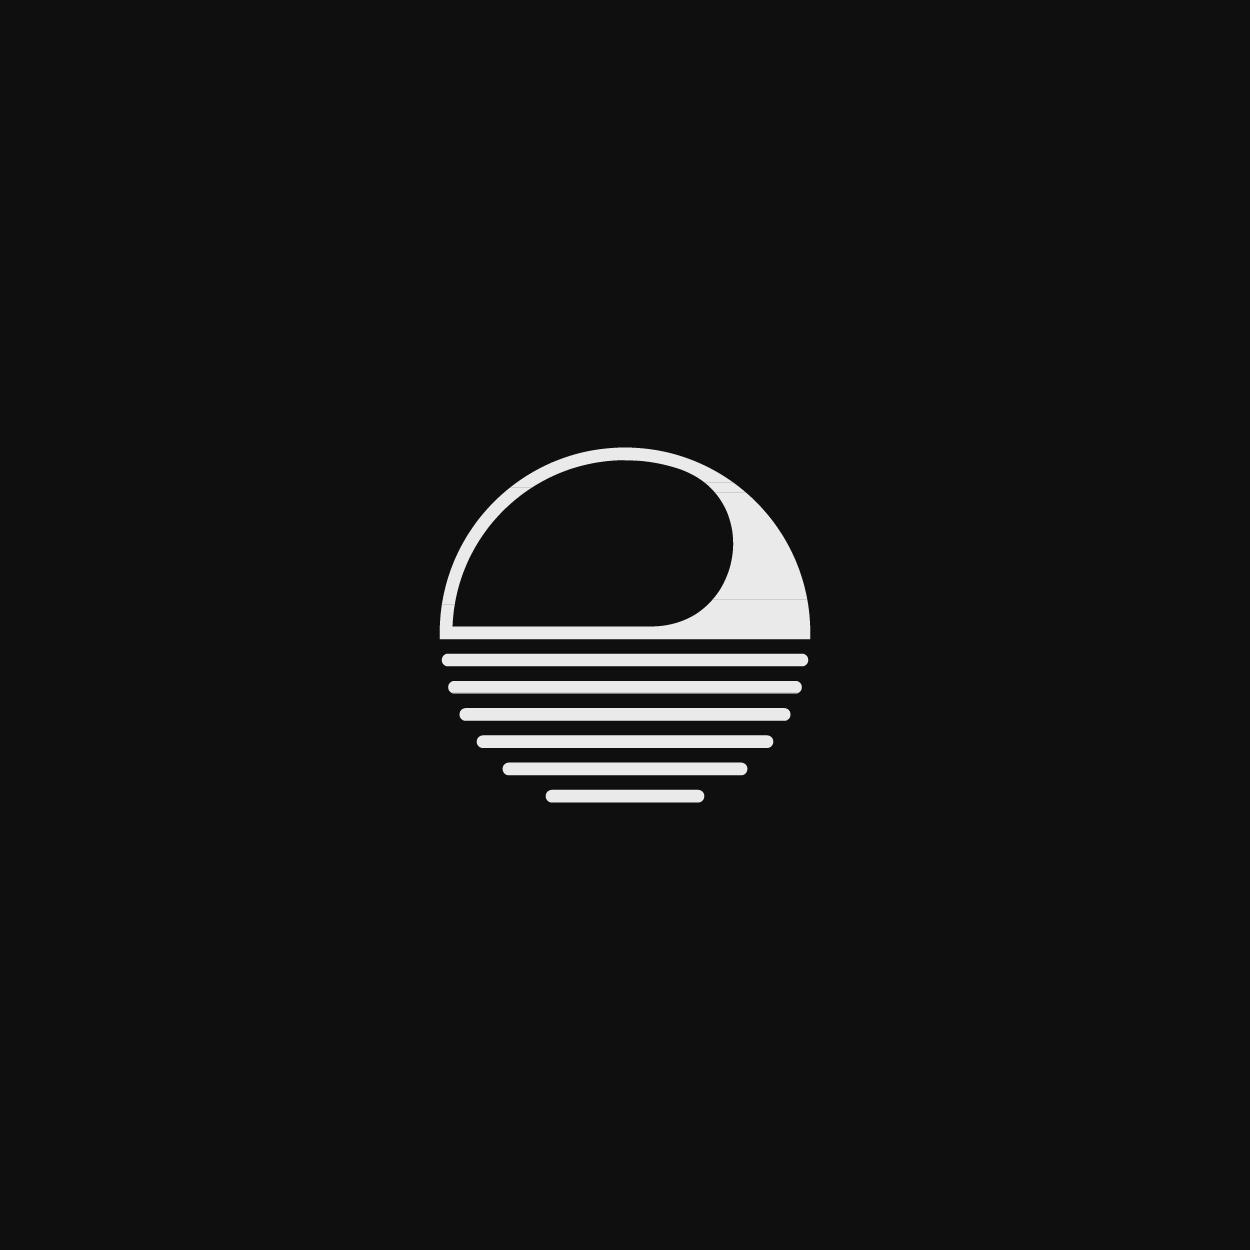 Sylvan_Logofolio2019_Artboard 104 copy1250.jpg